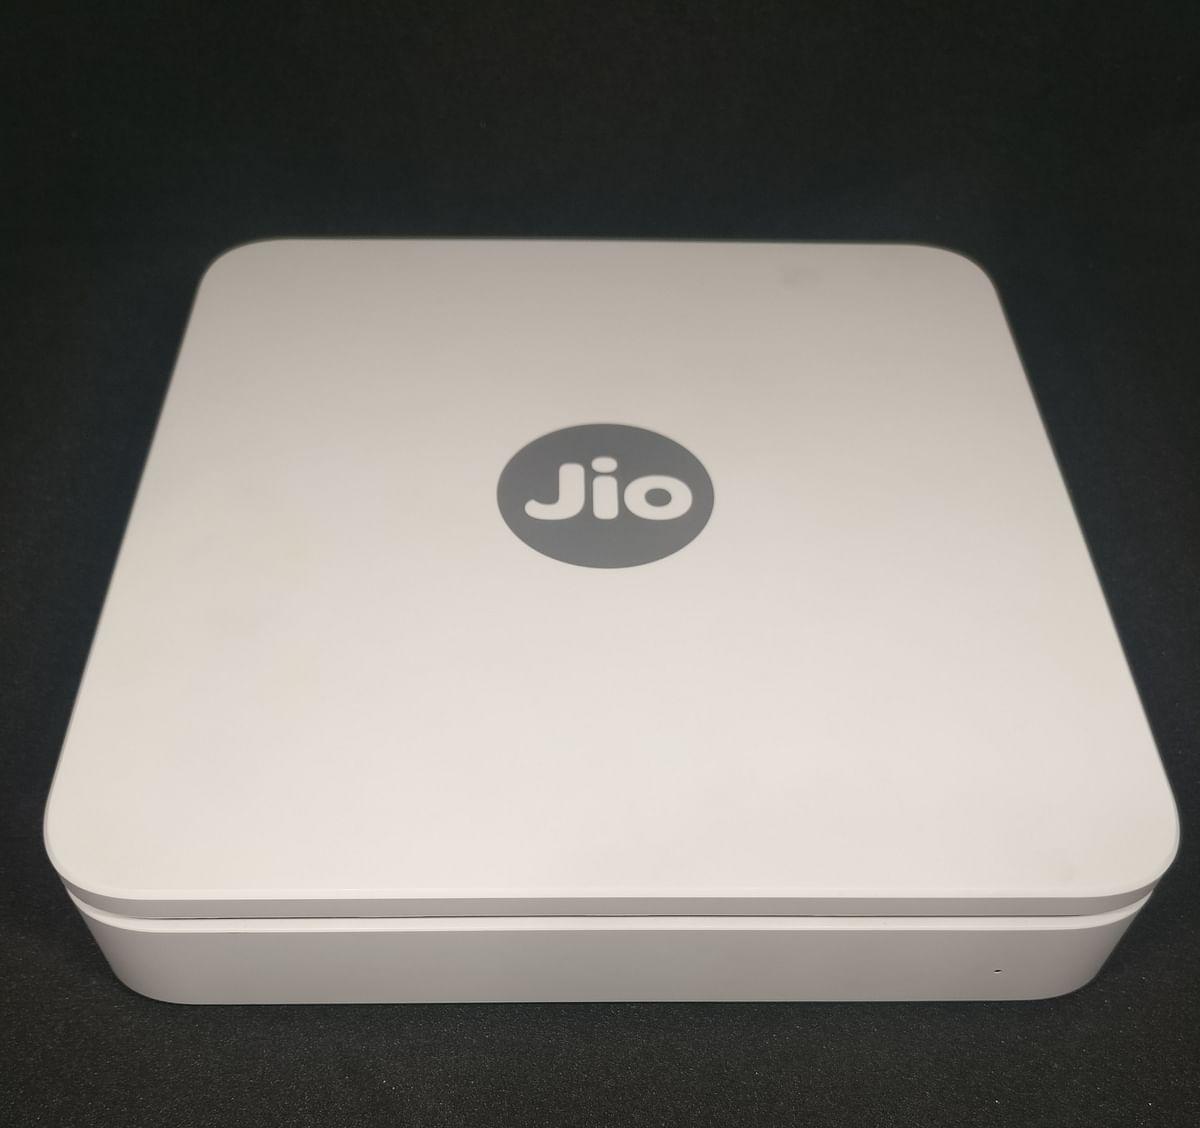 JioGigaFiber modem arranged for a photograph. (Photographer: Anirudh Saligrama/BloombergQuint)